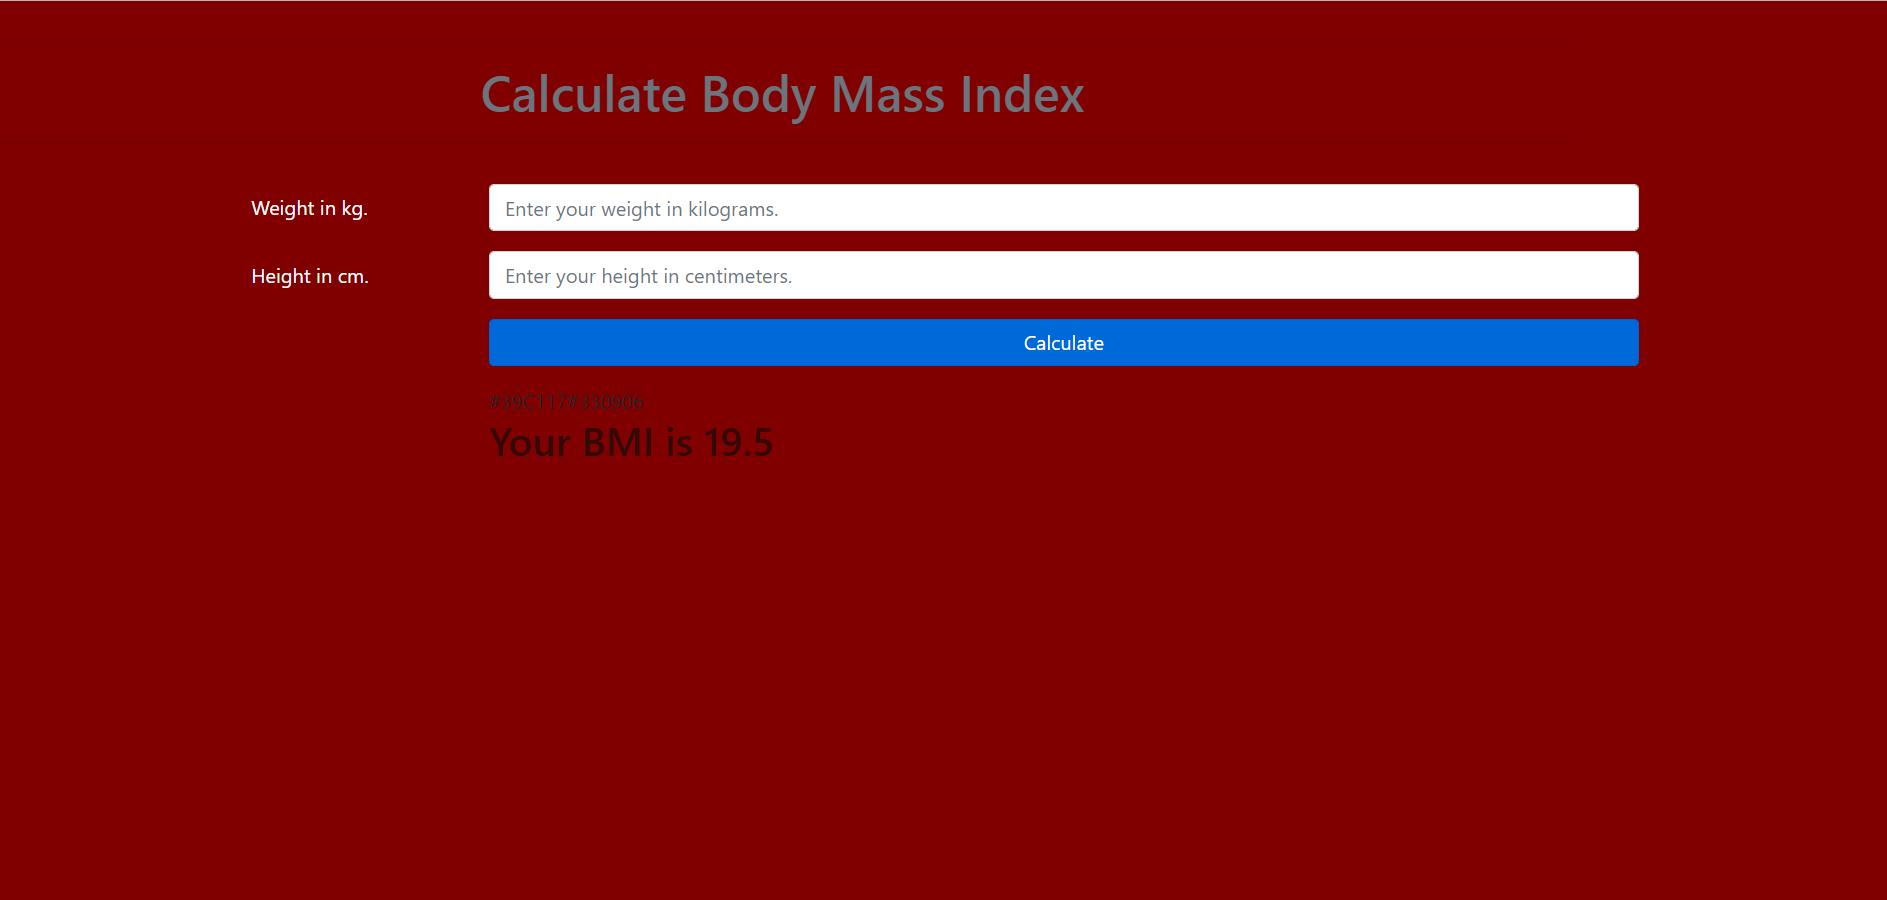 image of bmi calculator